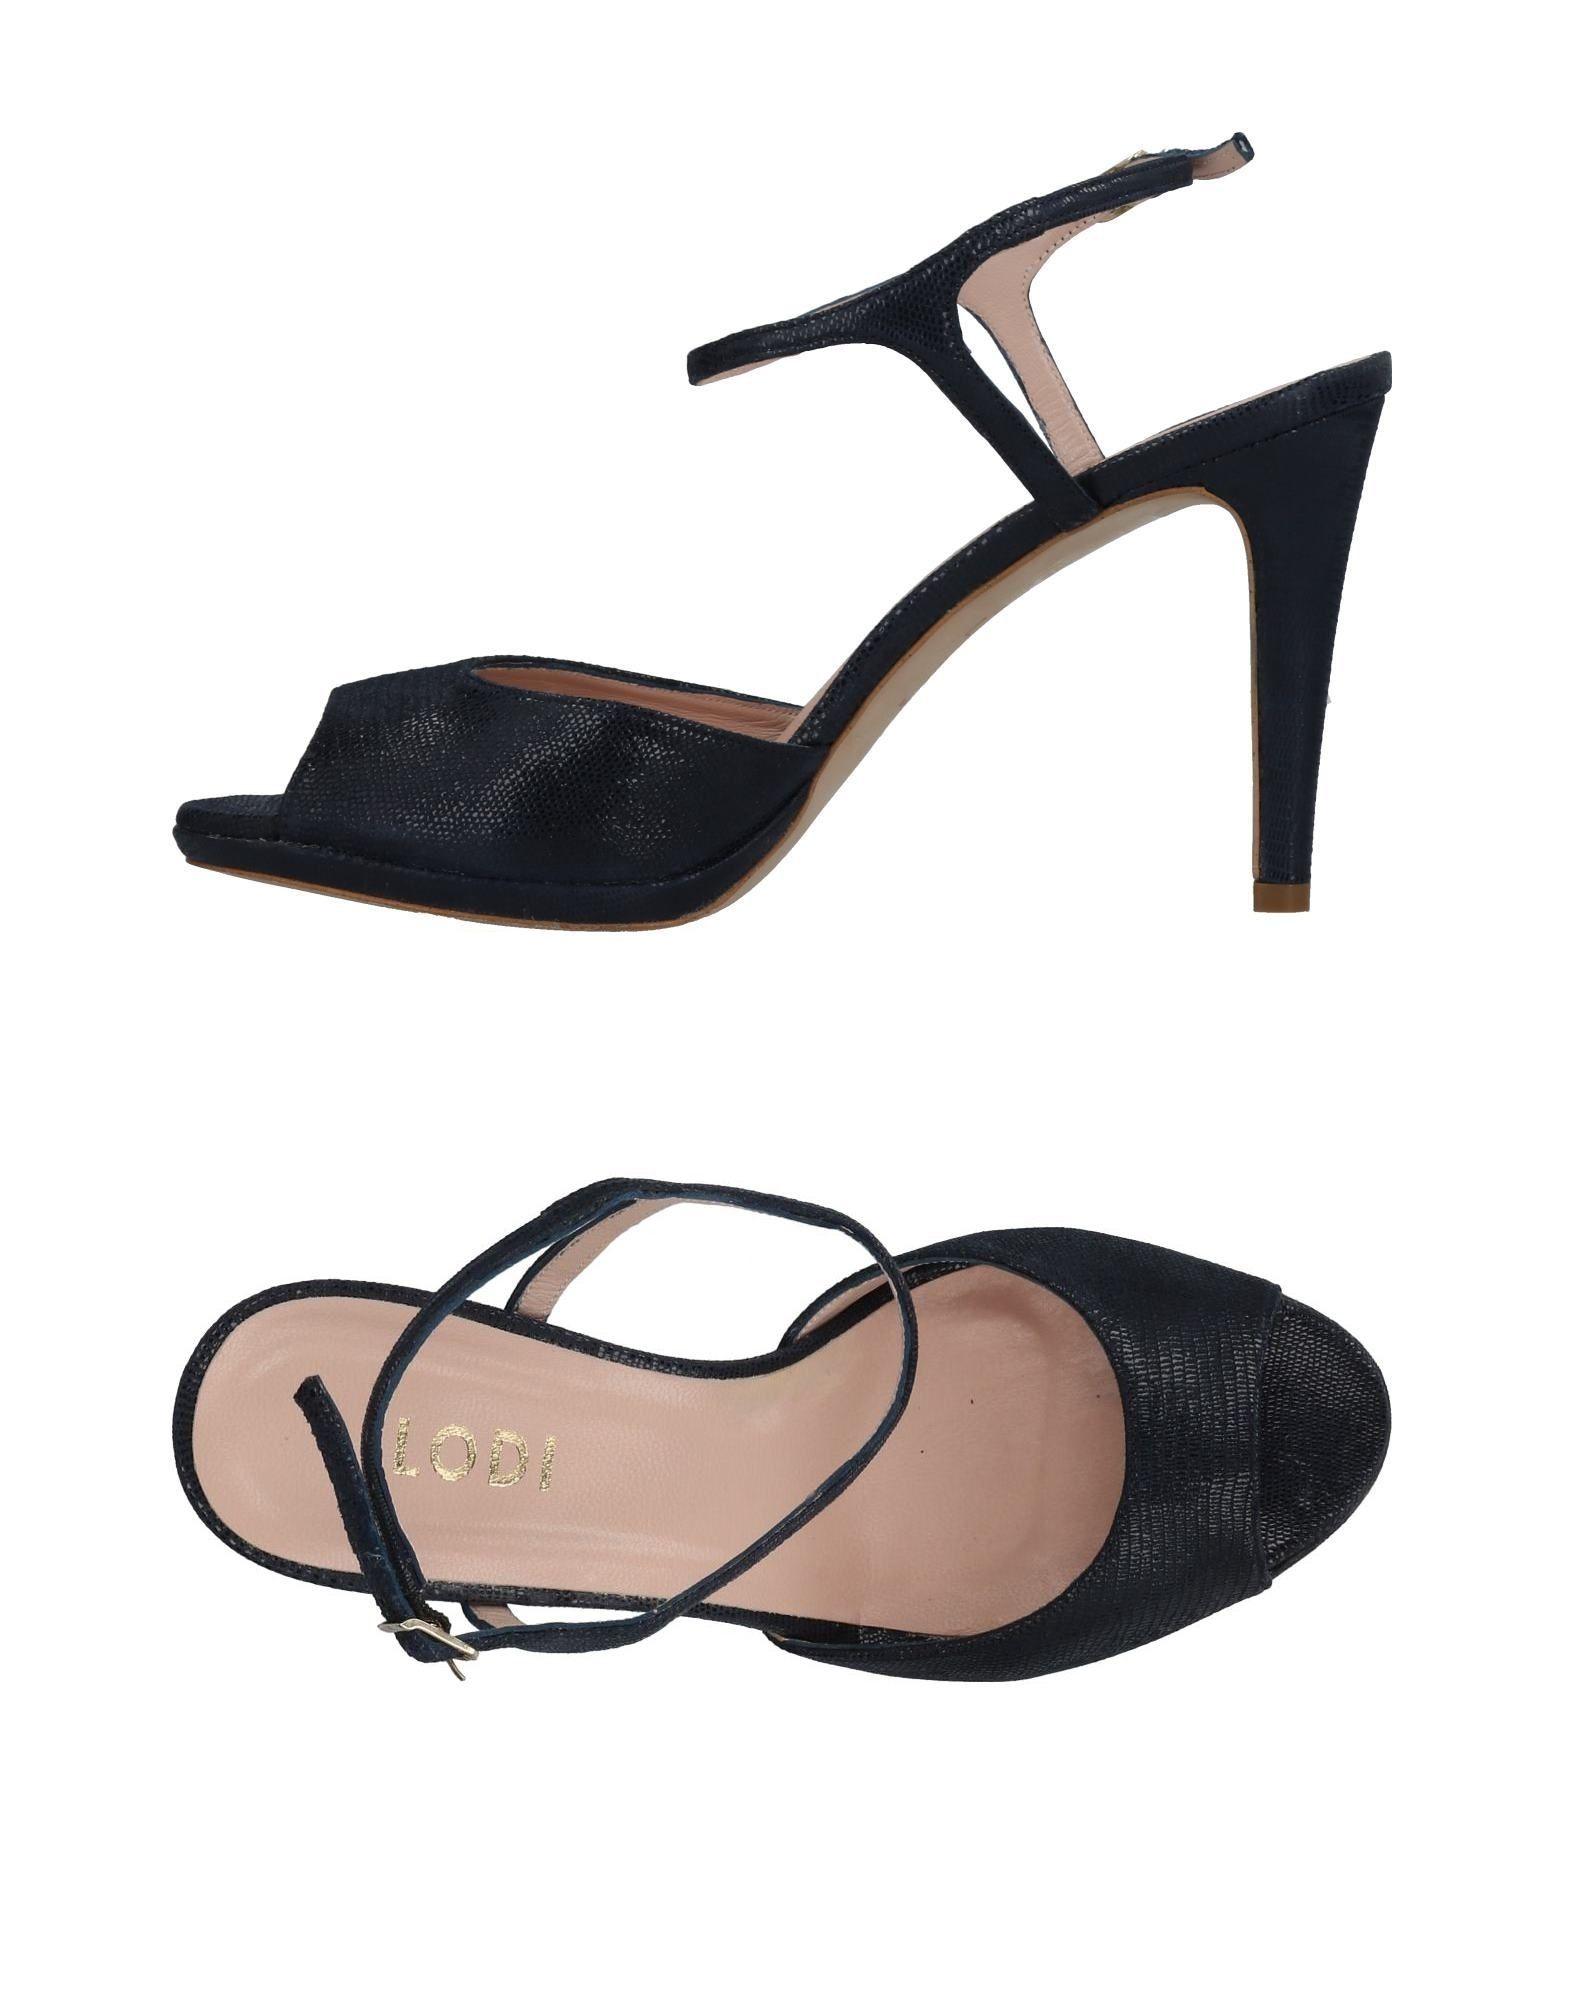 Lodi Sandalen Damen  Qualität 11457785BX Gute Qualität  beliebte Schuhe 86837f